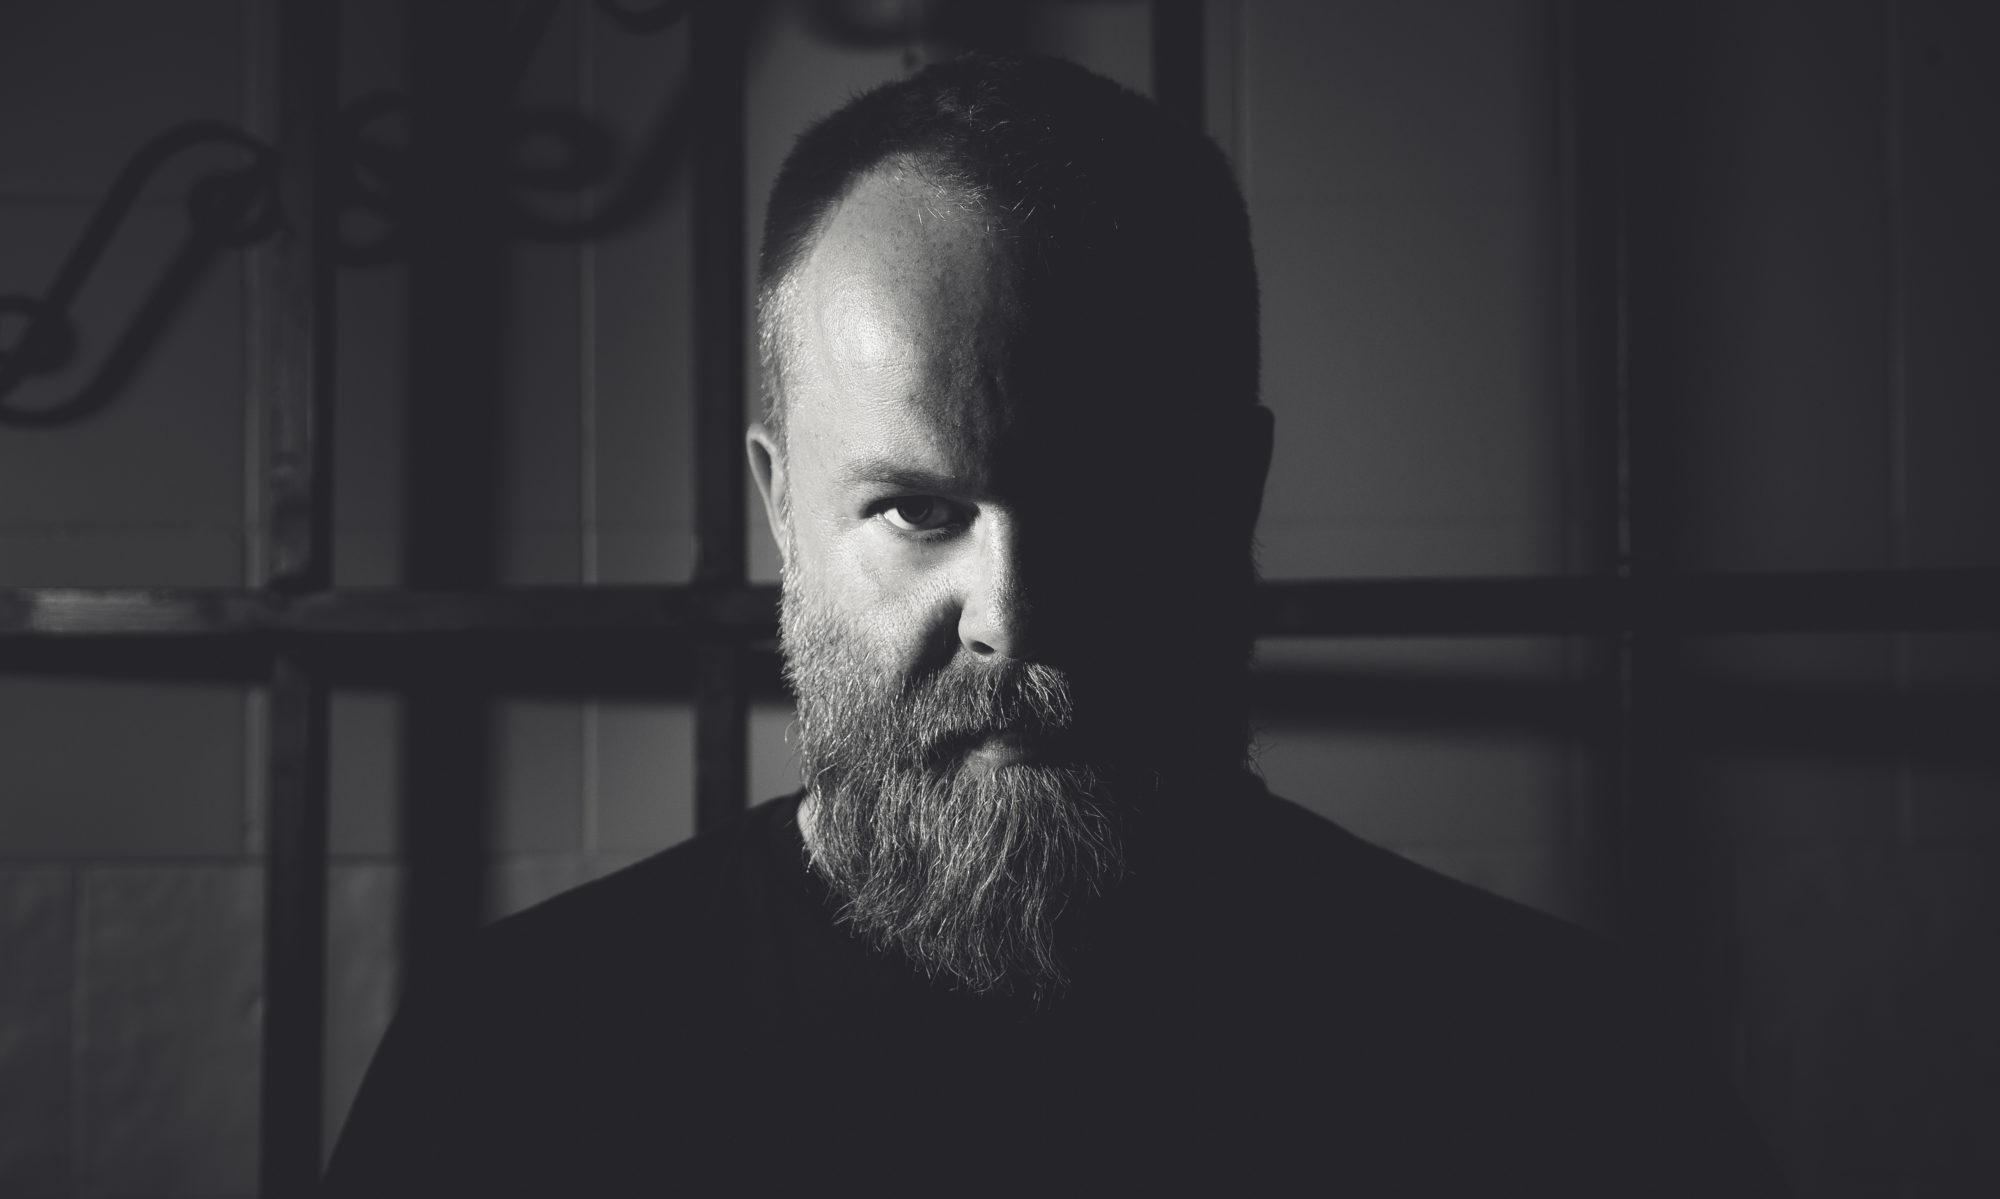 Bjørn Riis